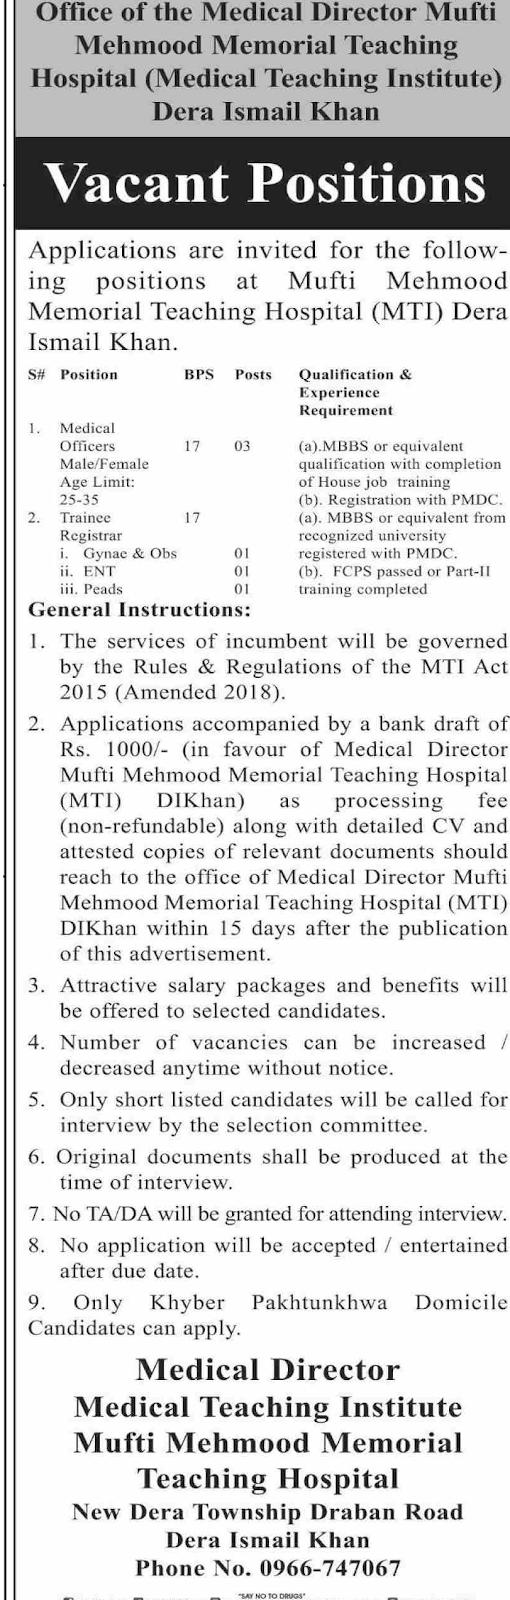 Jobs in Memorial Teaching Hospital (MTI) Dera Ismail Khan 2019